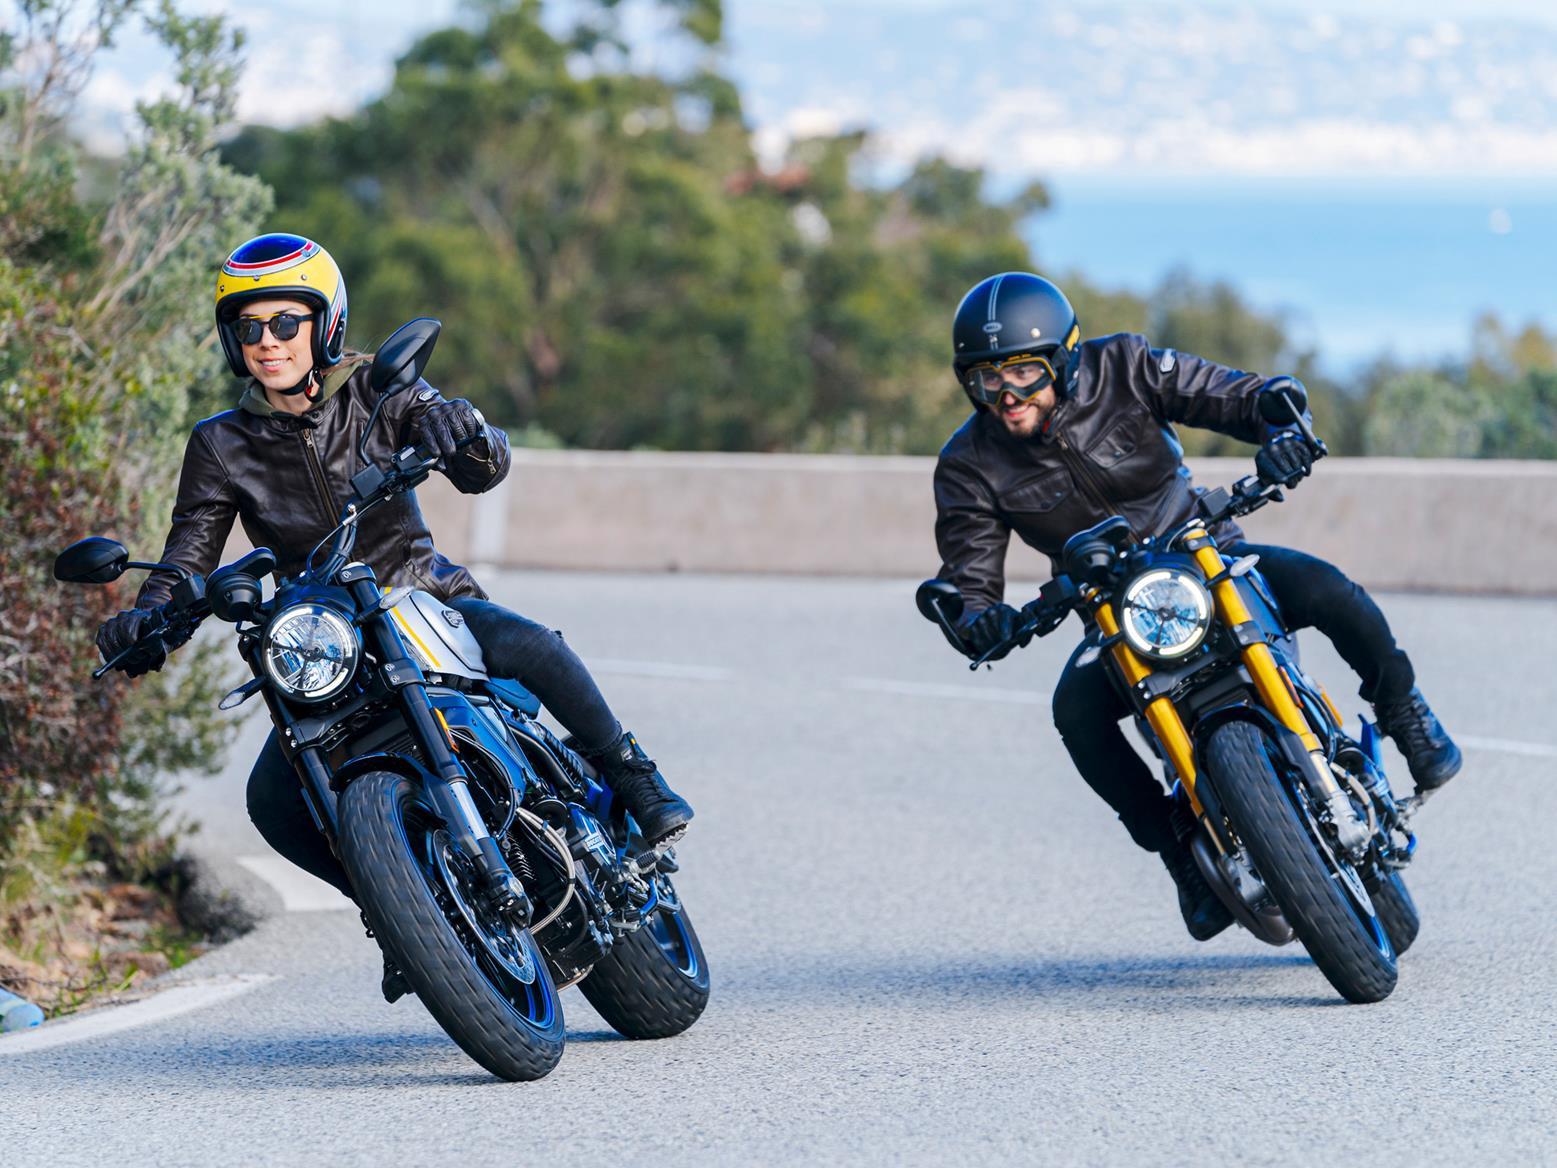 Ducati Scrambler 1100 in both Pro and Sport Pro guises